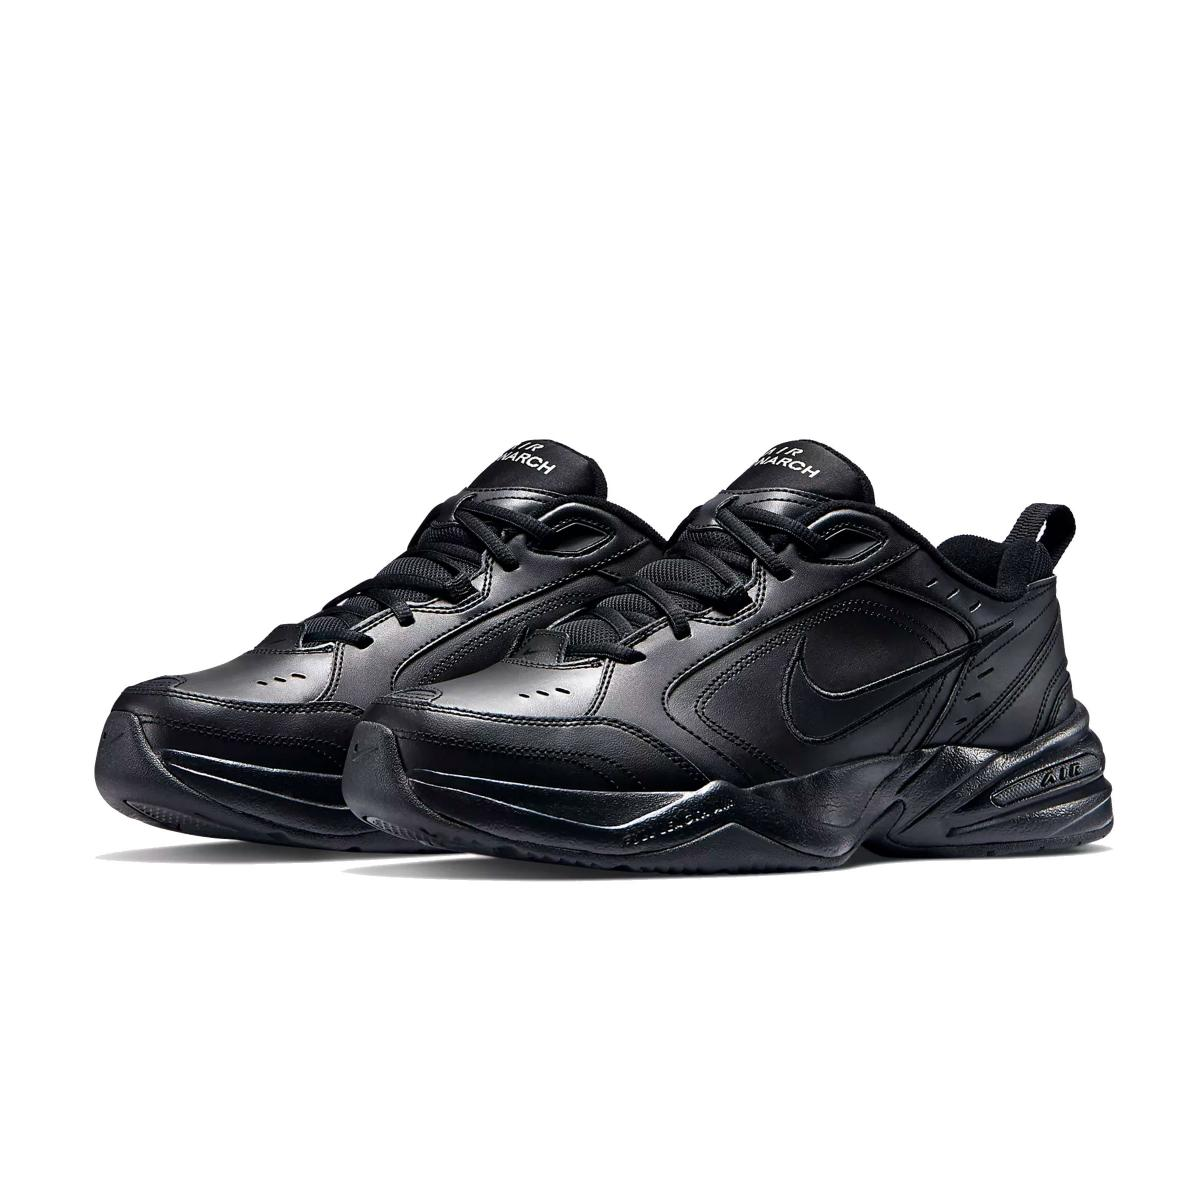 Scarpe Sneakers Nike Air Monarch IV da uomo rif. 415445 001